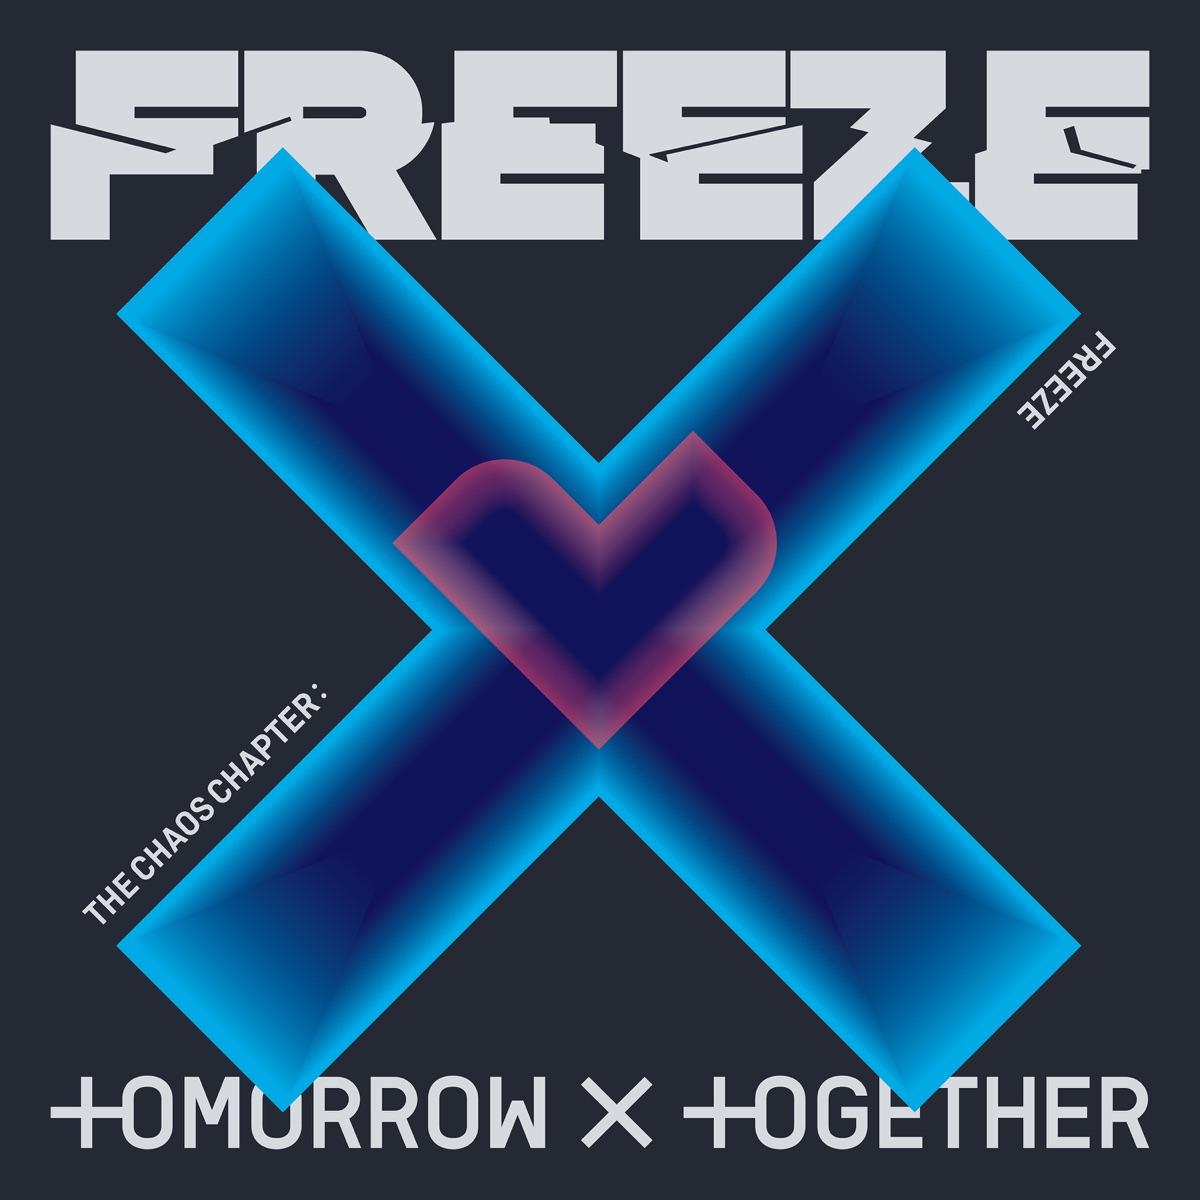 『TOMORROW X TOGETHER - Magic』収録の『The Chaos Chapter : FREEZE』ジャケット